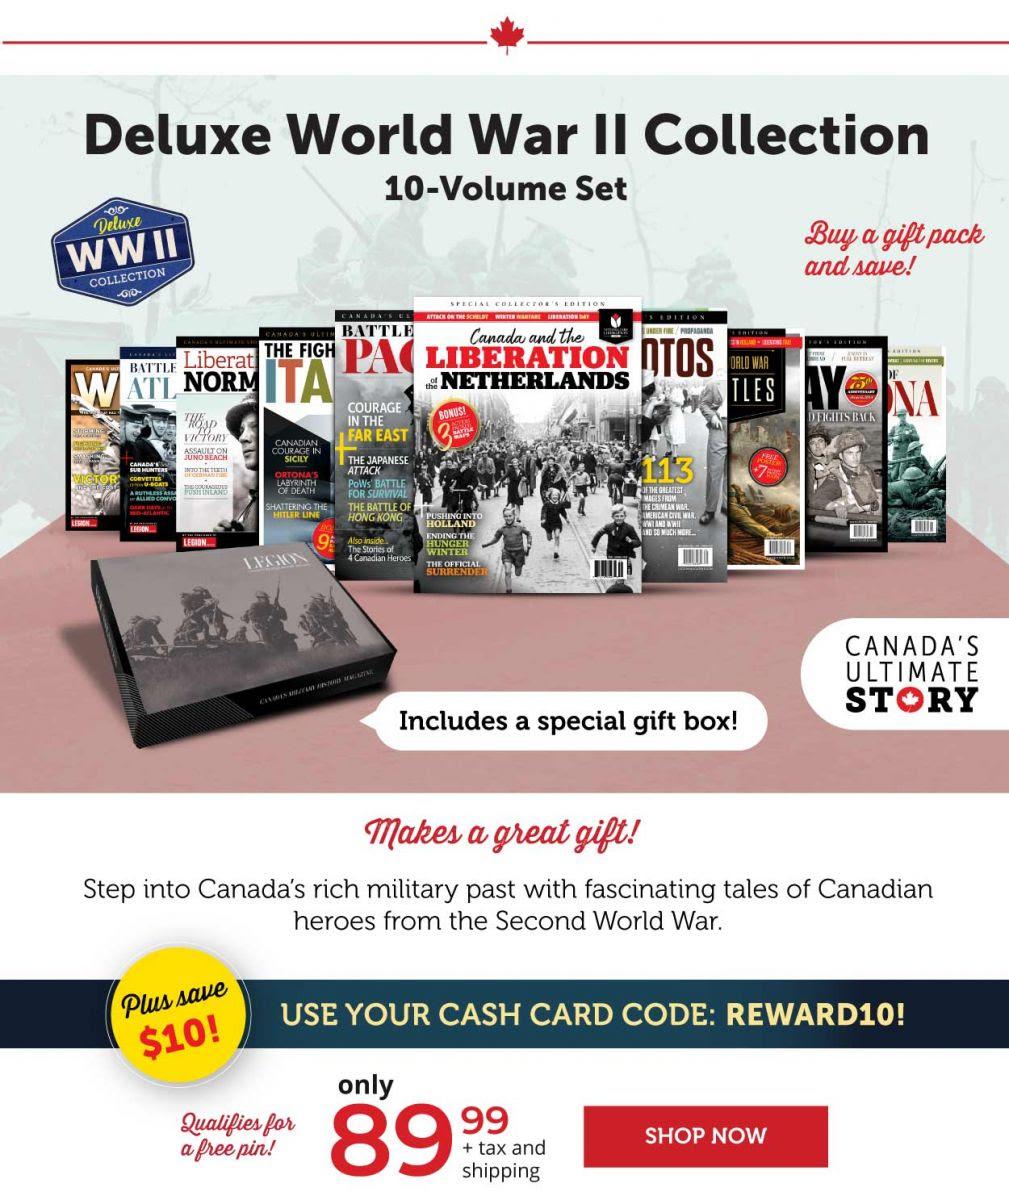 Second world war collection